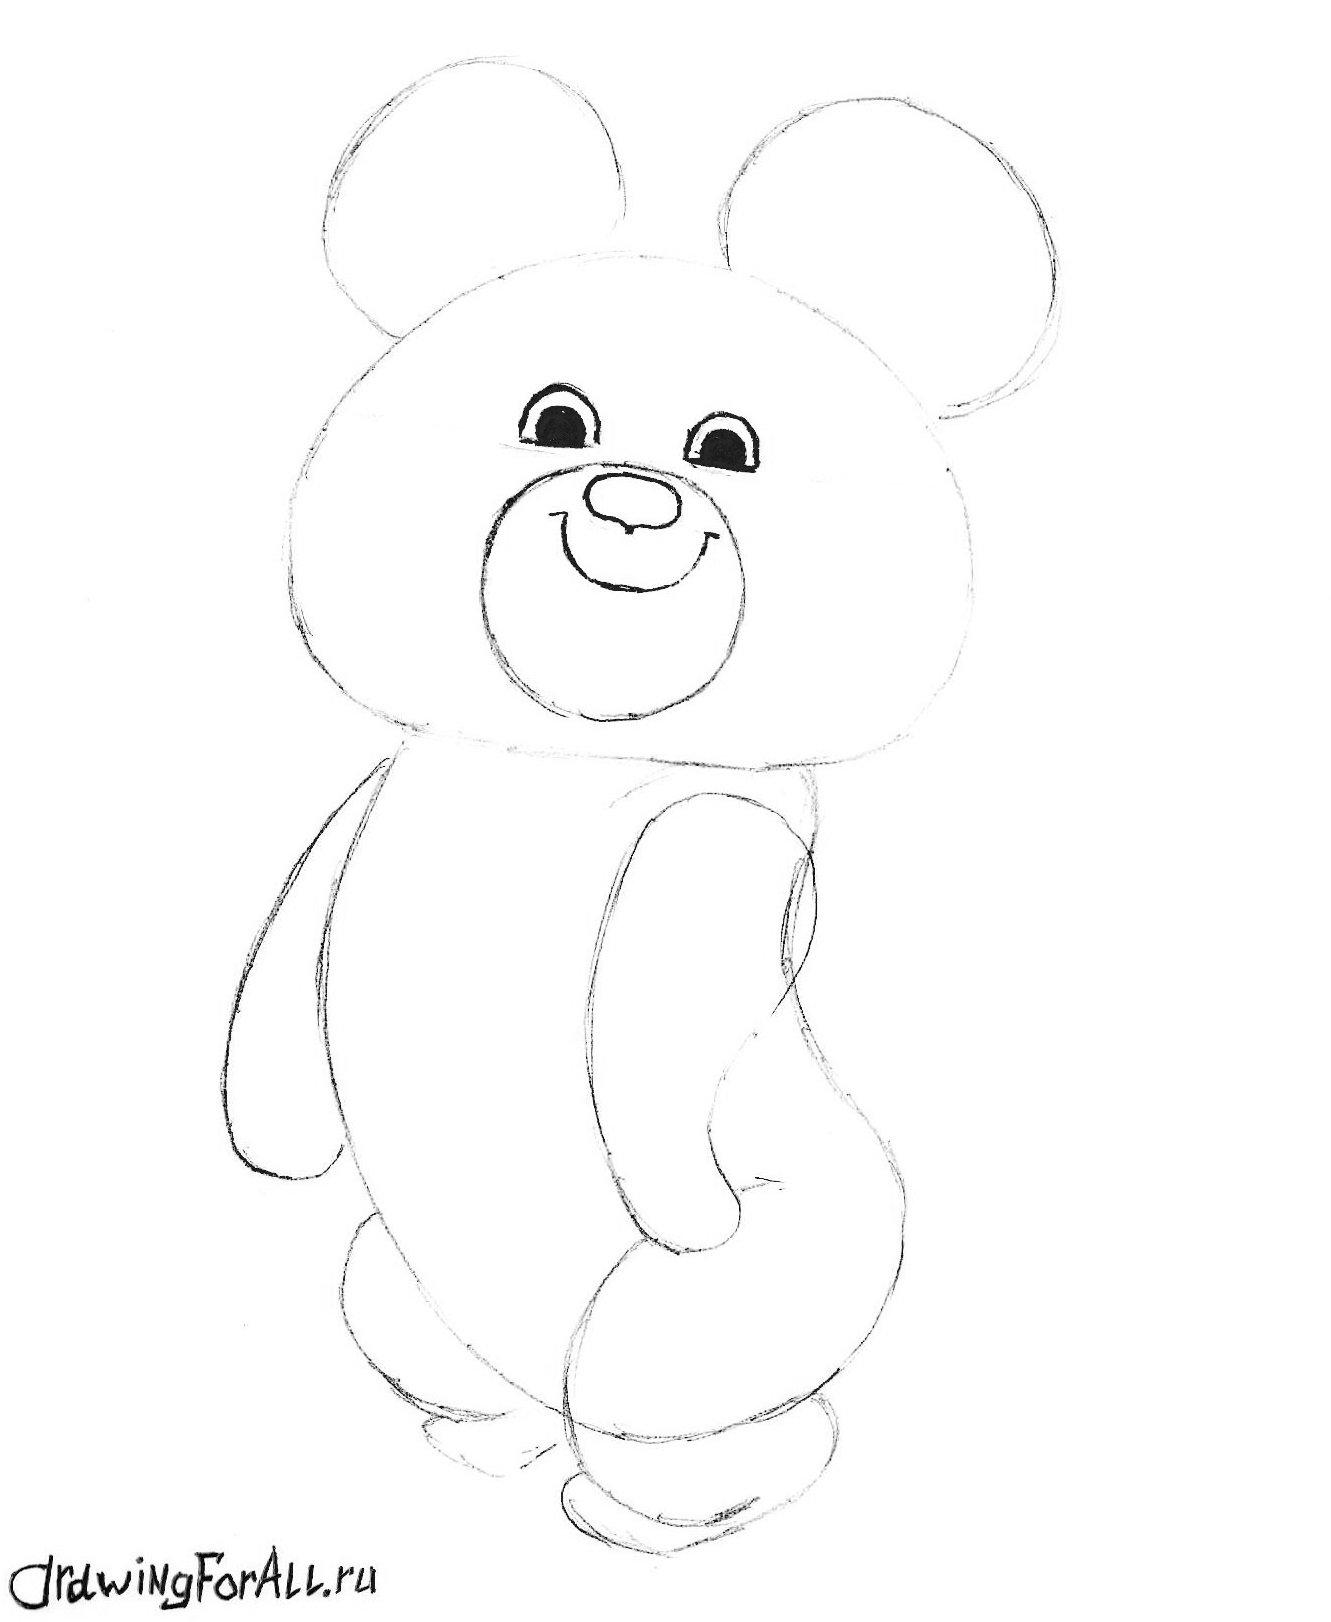 рисуем олимпийского мишку поэтапно карандашом фото